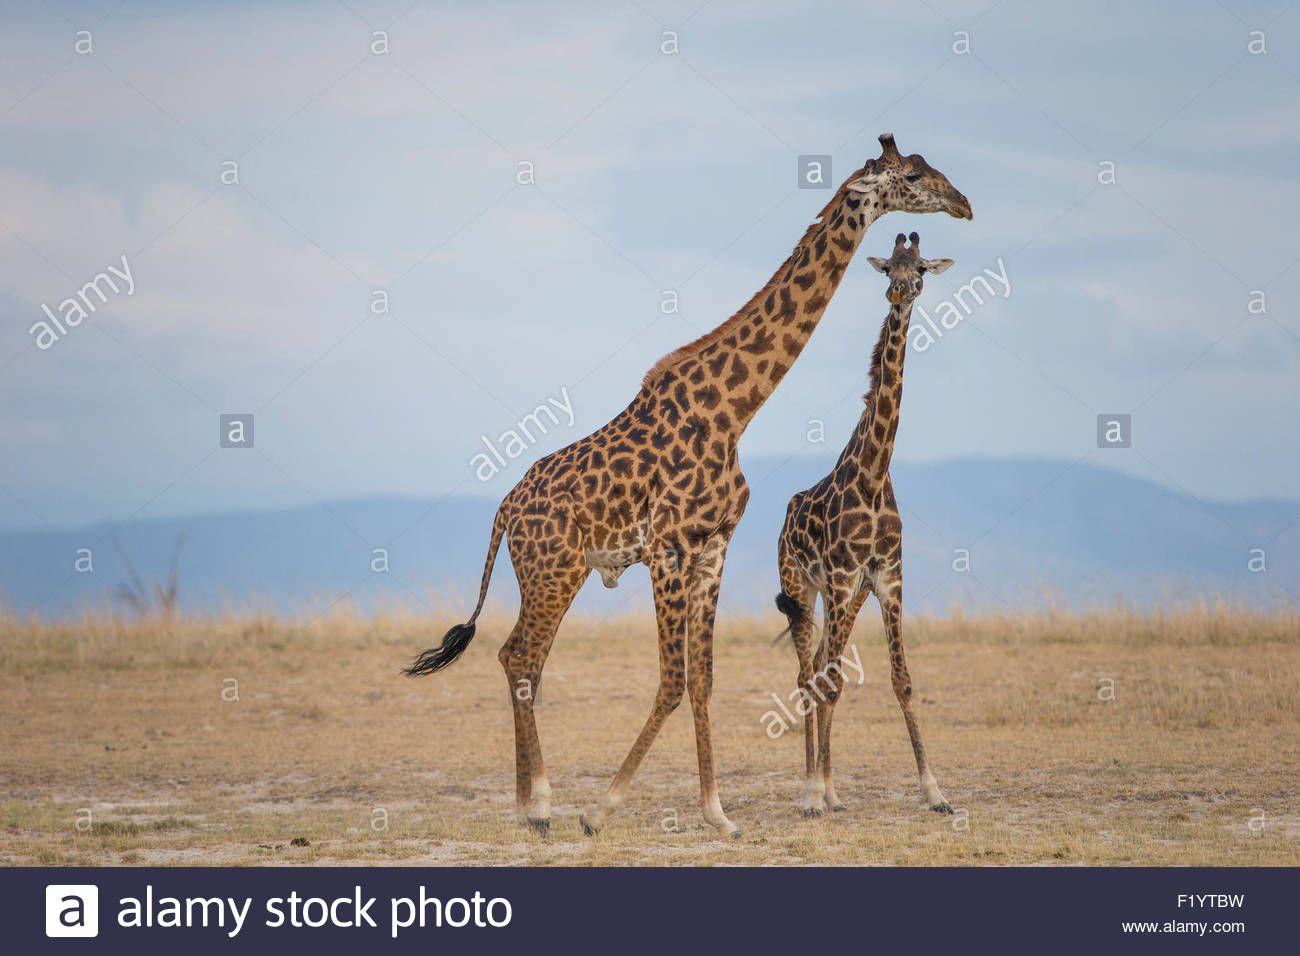 Download this stock image Masai Giraffe (Giraffa